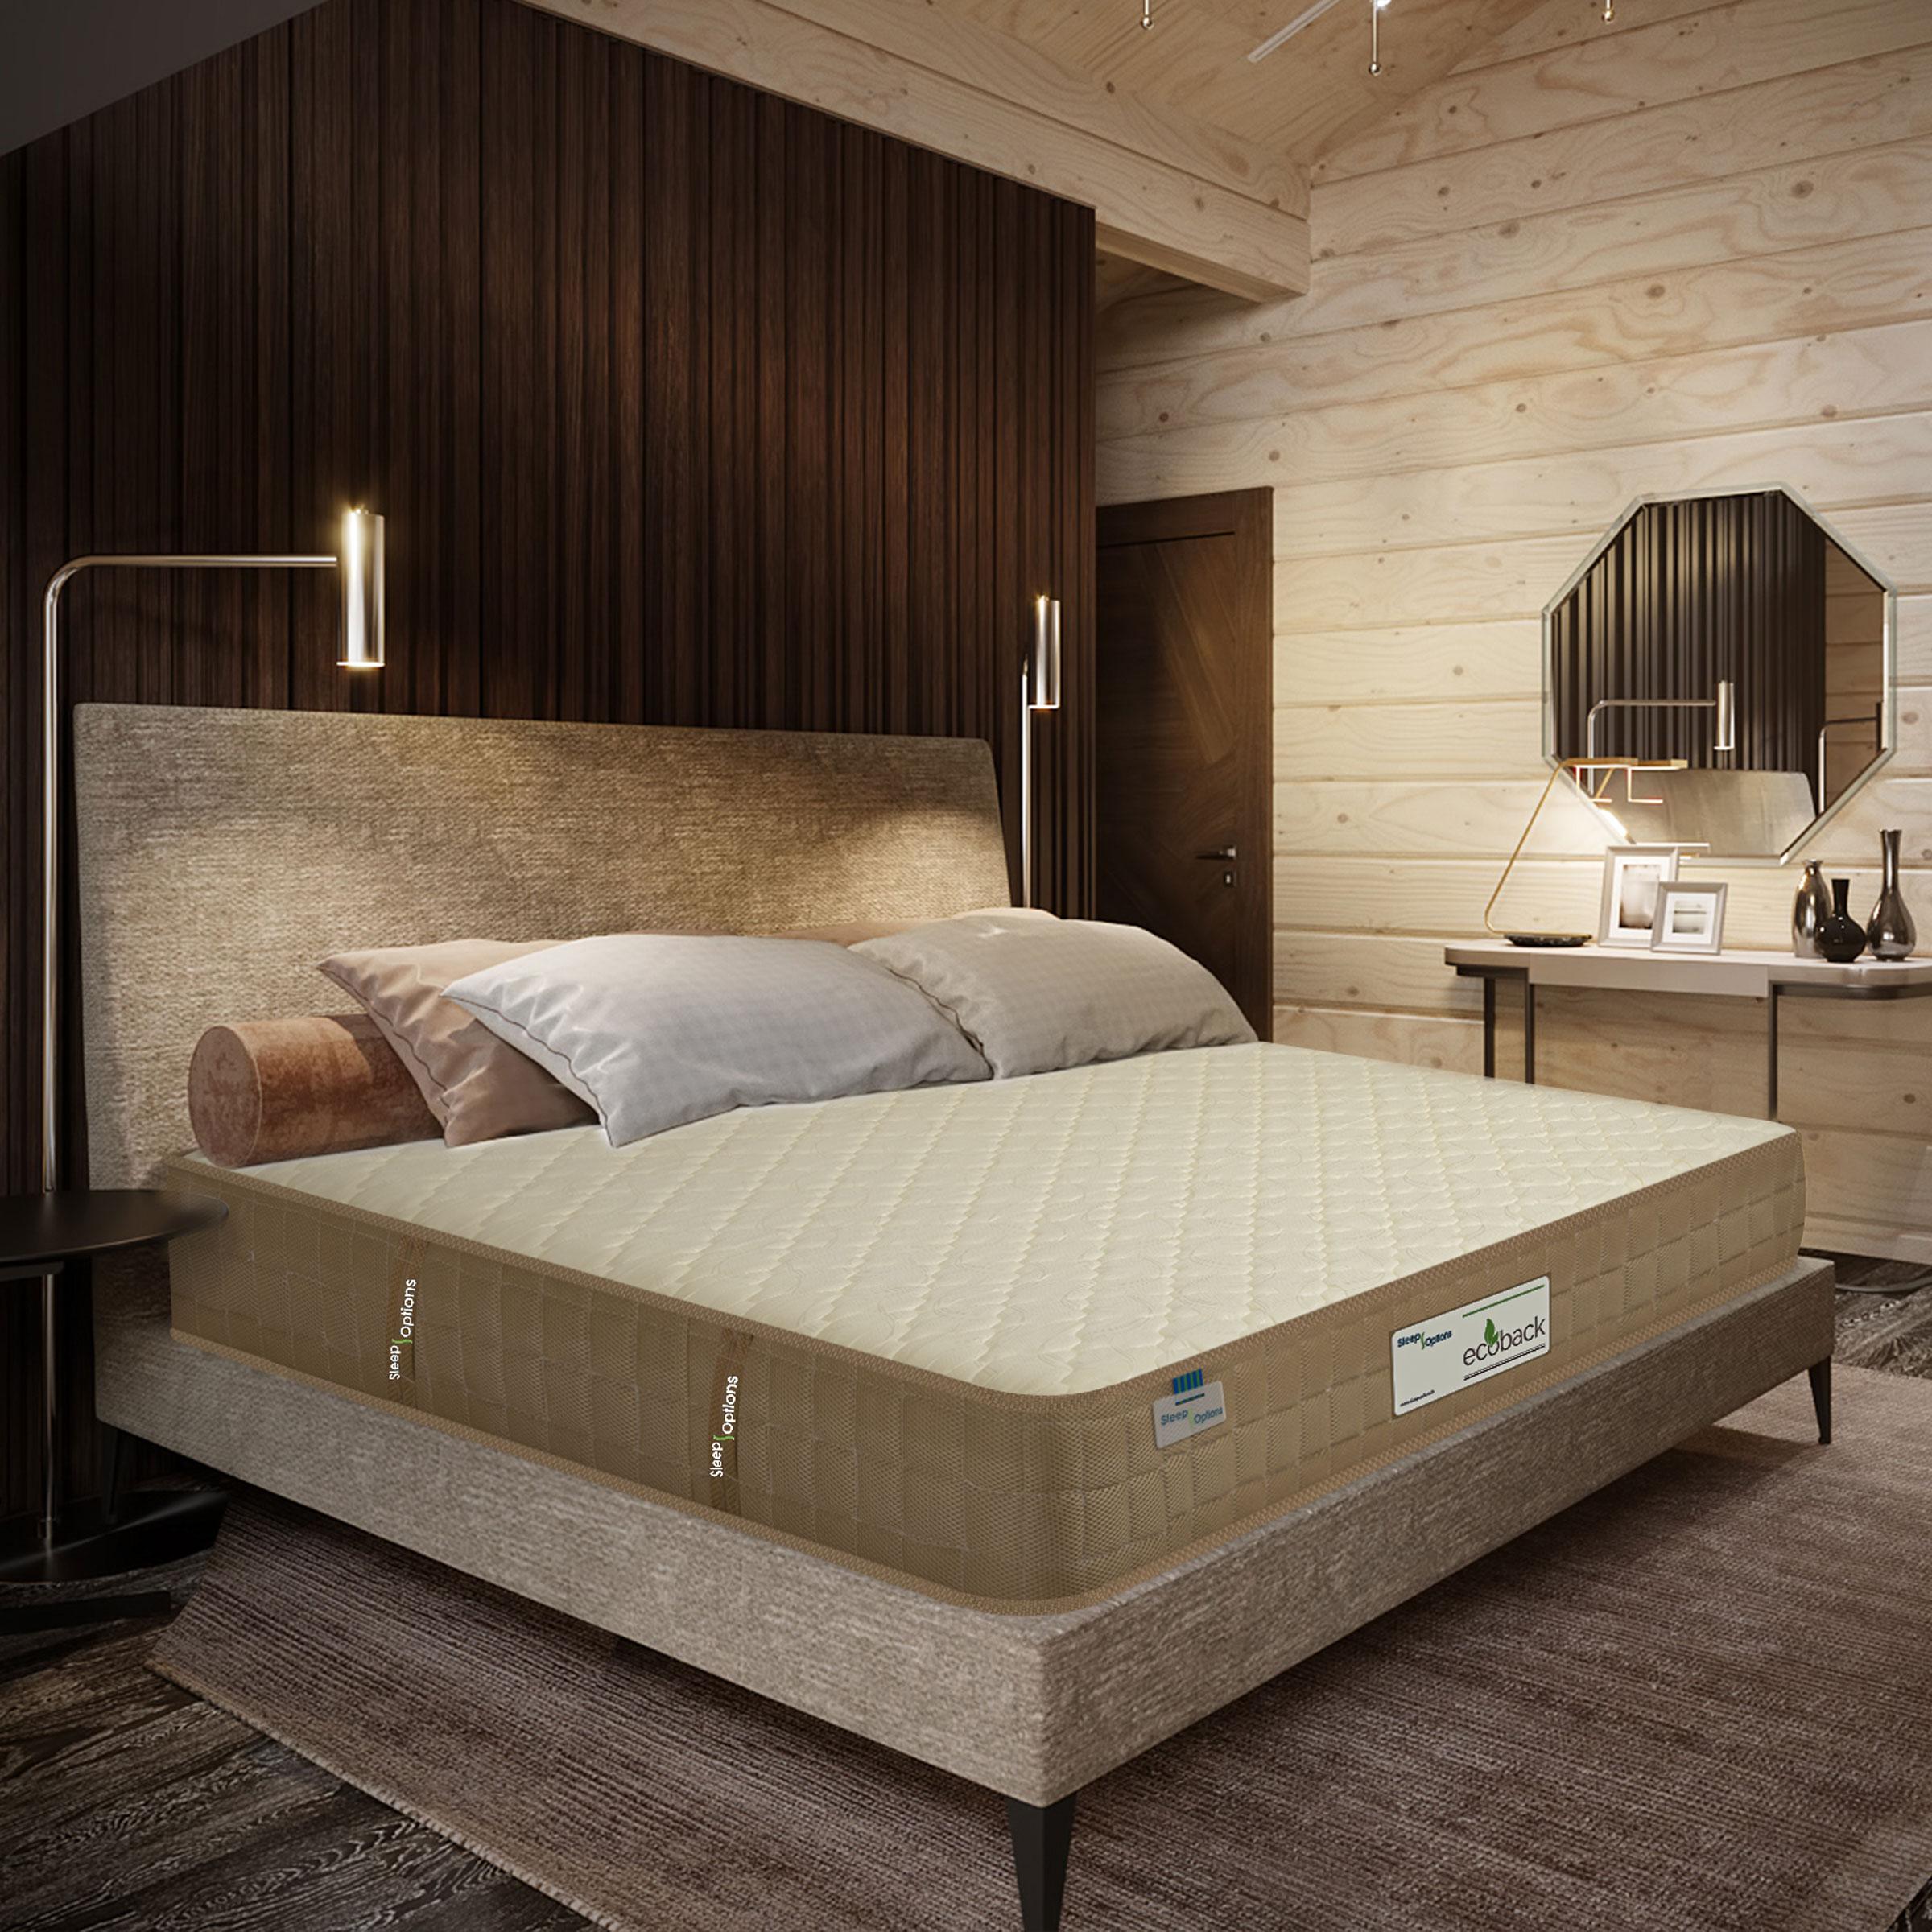 Sleep Options Ecoback  Dual Comfort Medium Firm Normal Top 5 Inch Foam Mattress  72x72x5 Inch,King Size